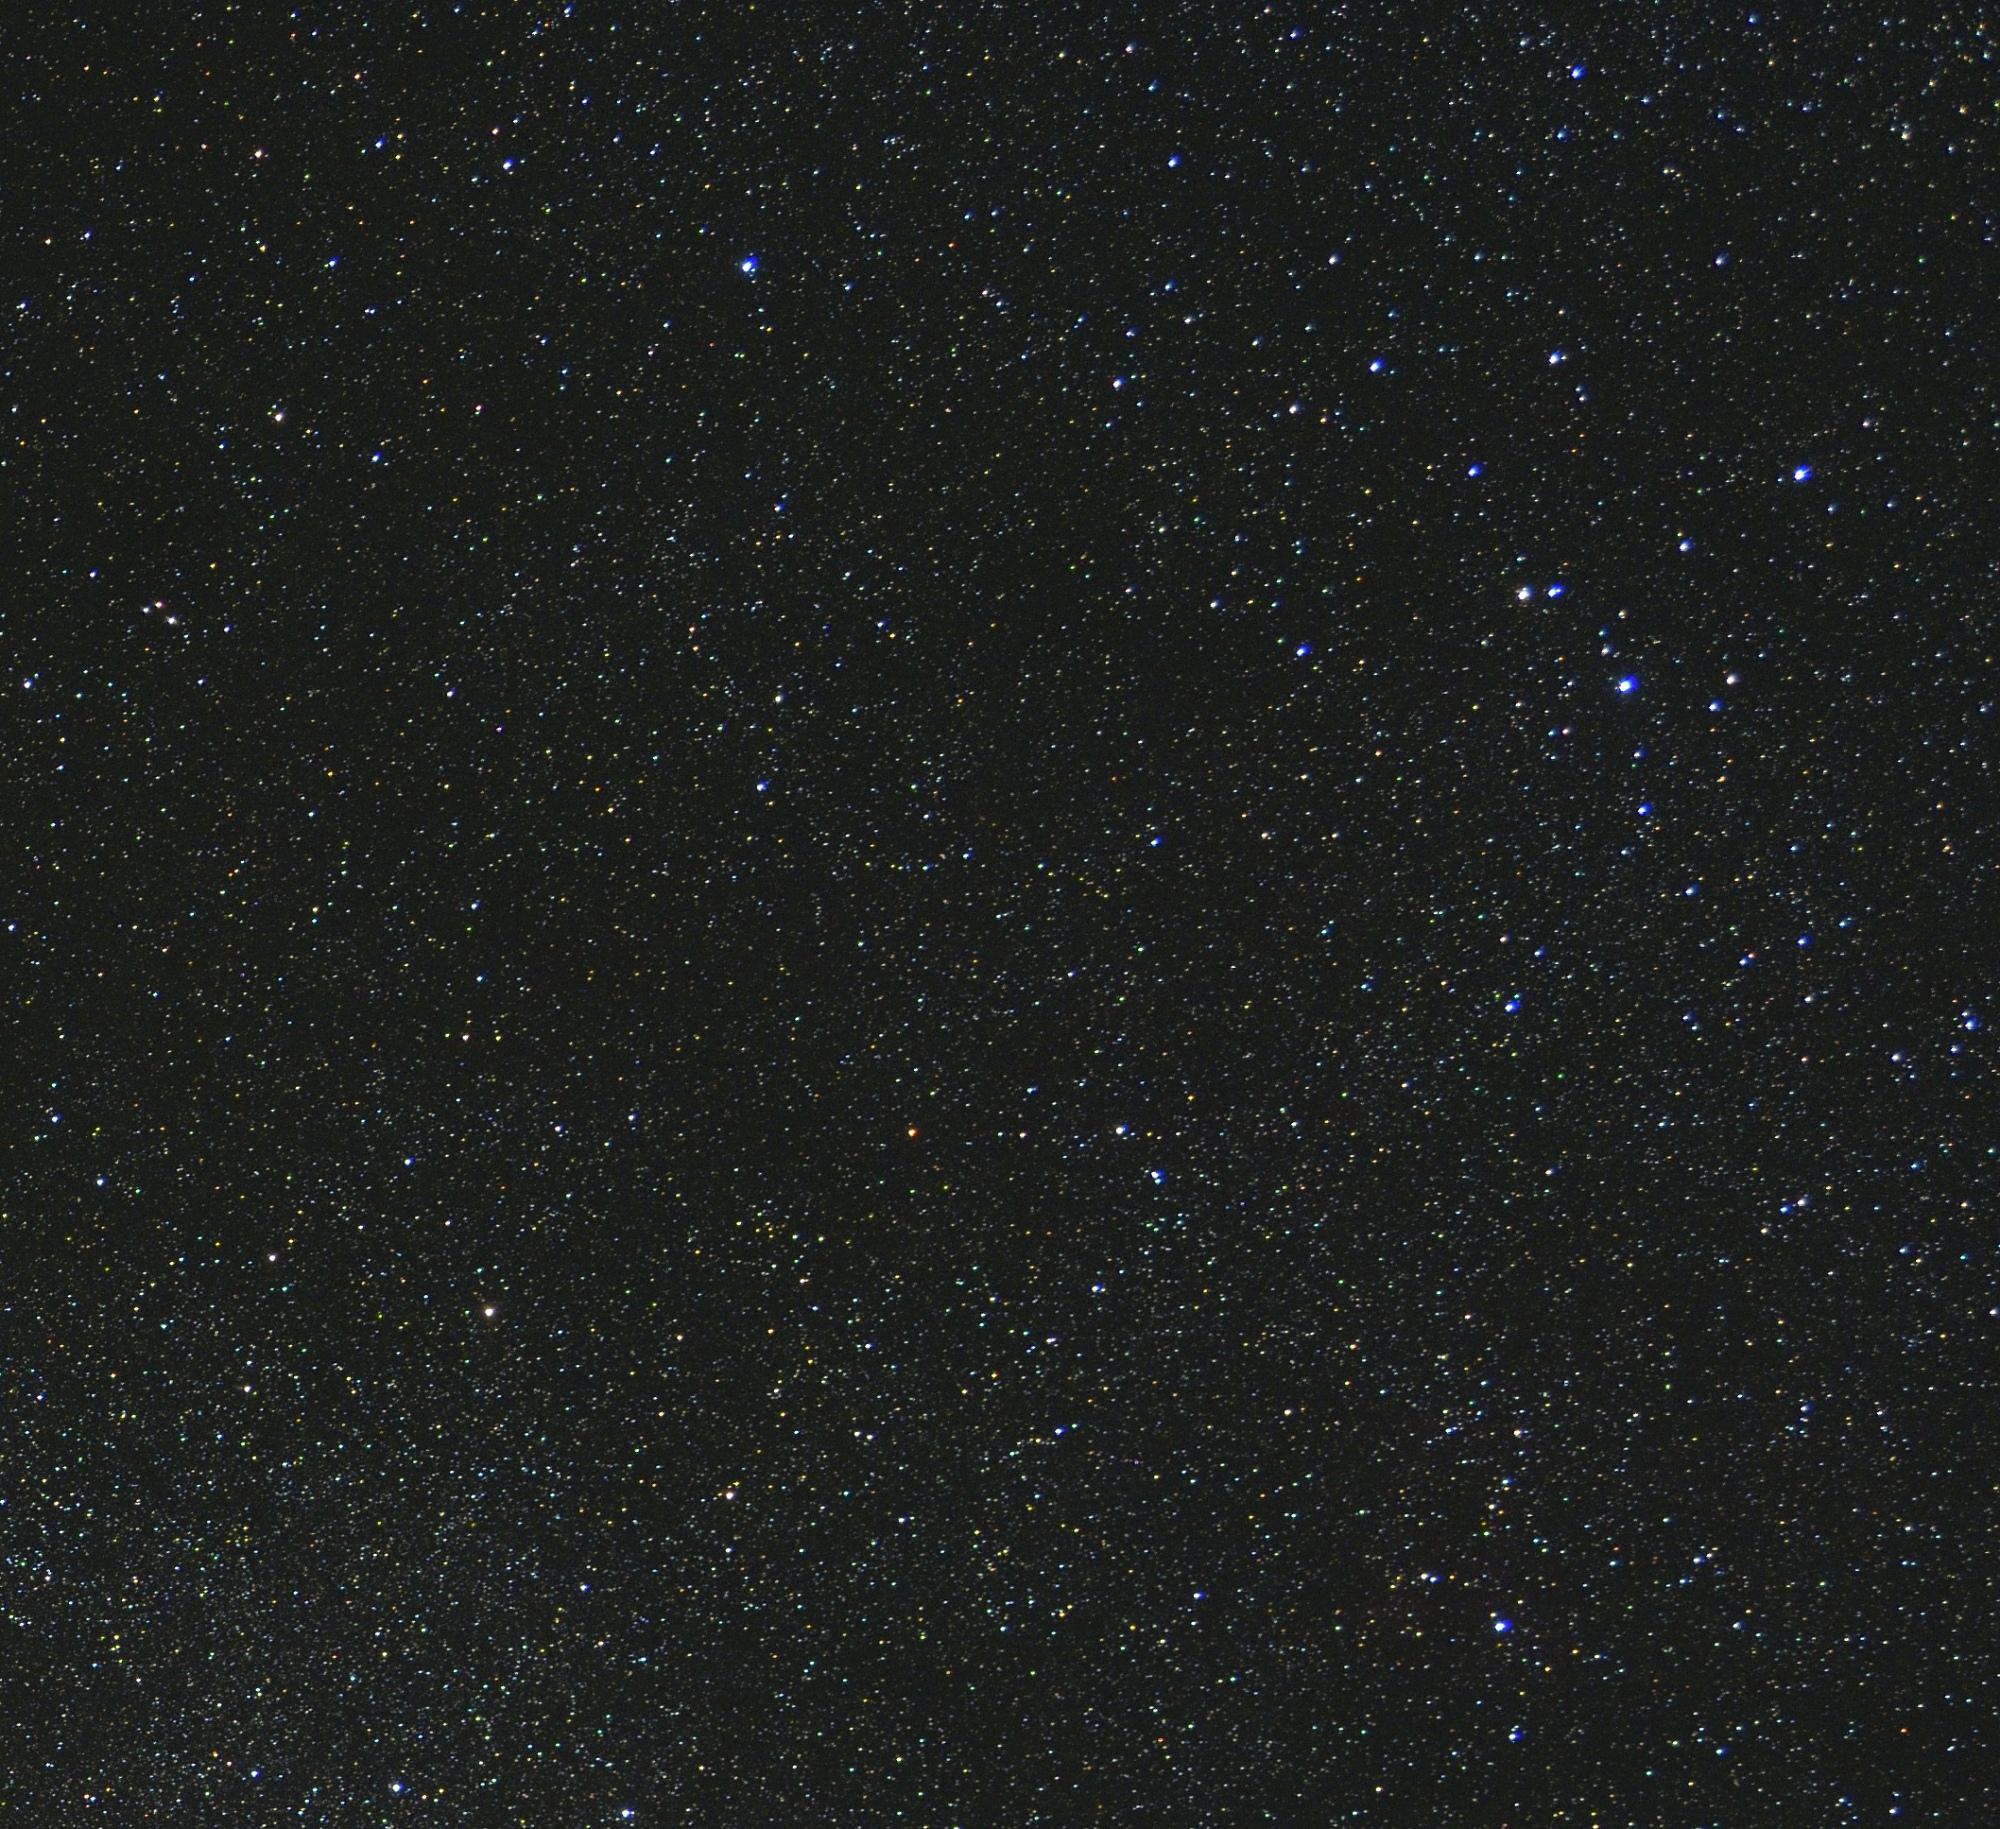 NGC7000-Crop_coin_sup_droit.jpg